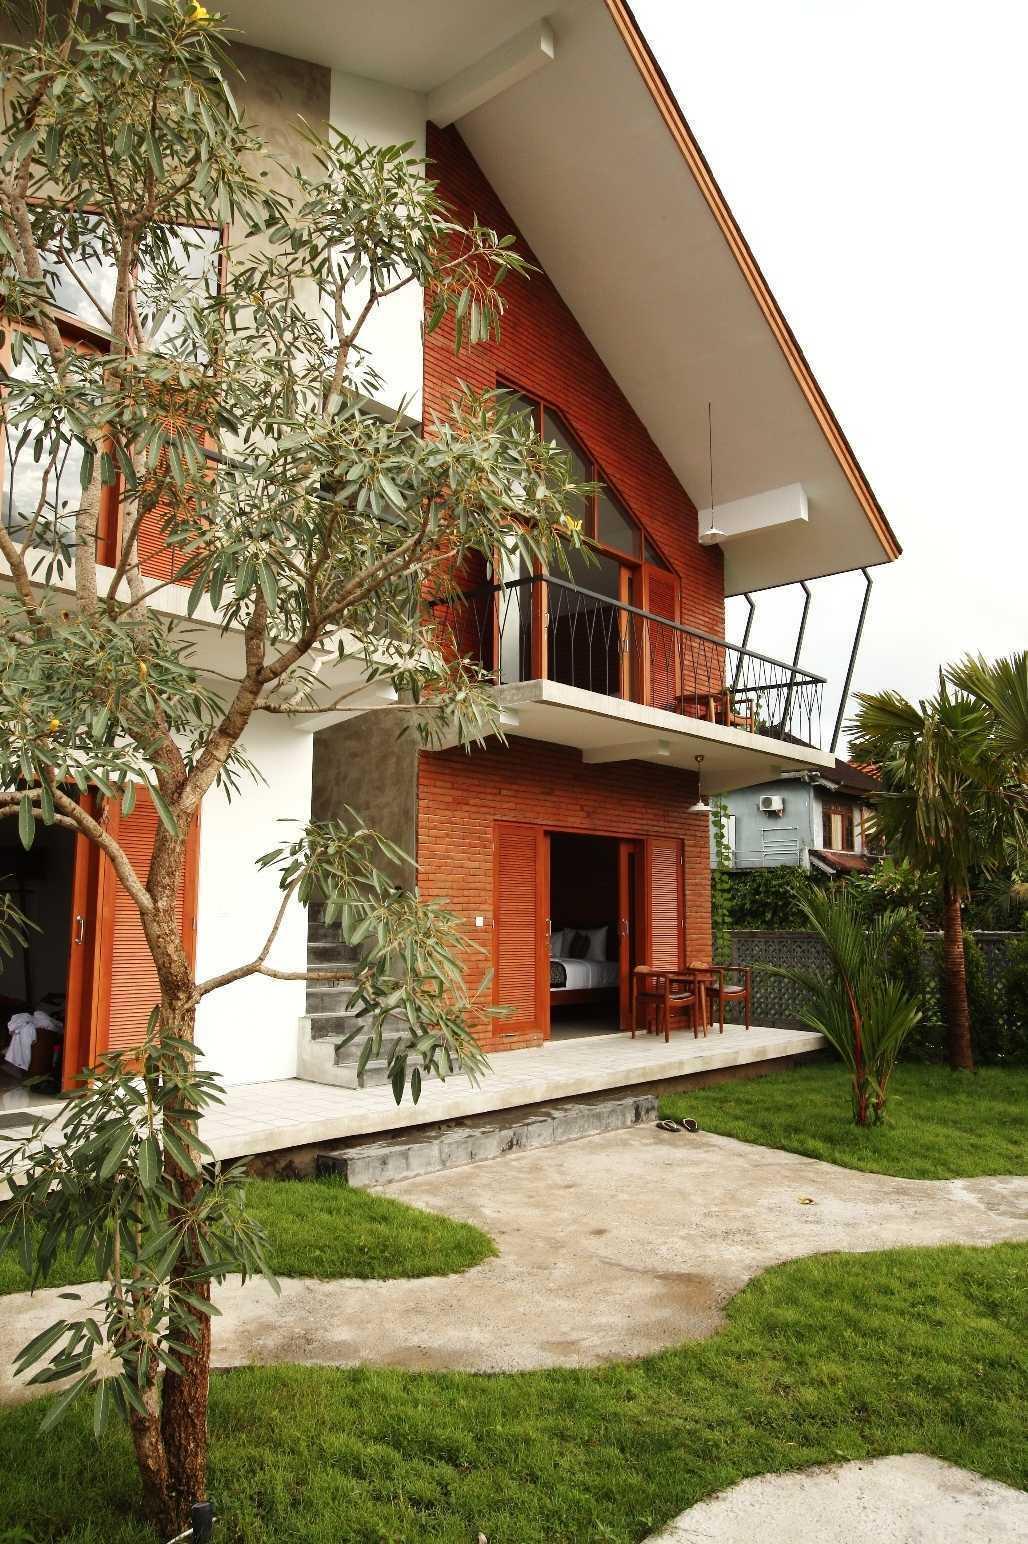 Ddap Architect Kubu Tropis Lodge Accommodation Ubud, Kabupaten Gianyar, Bali, Indonesia Bali Img0741 Tropis  28540